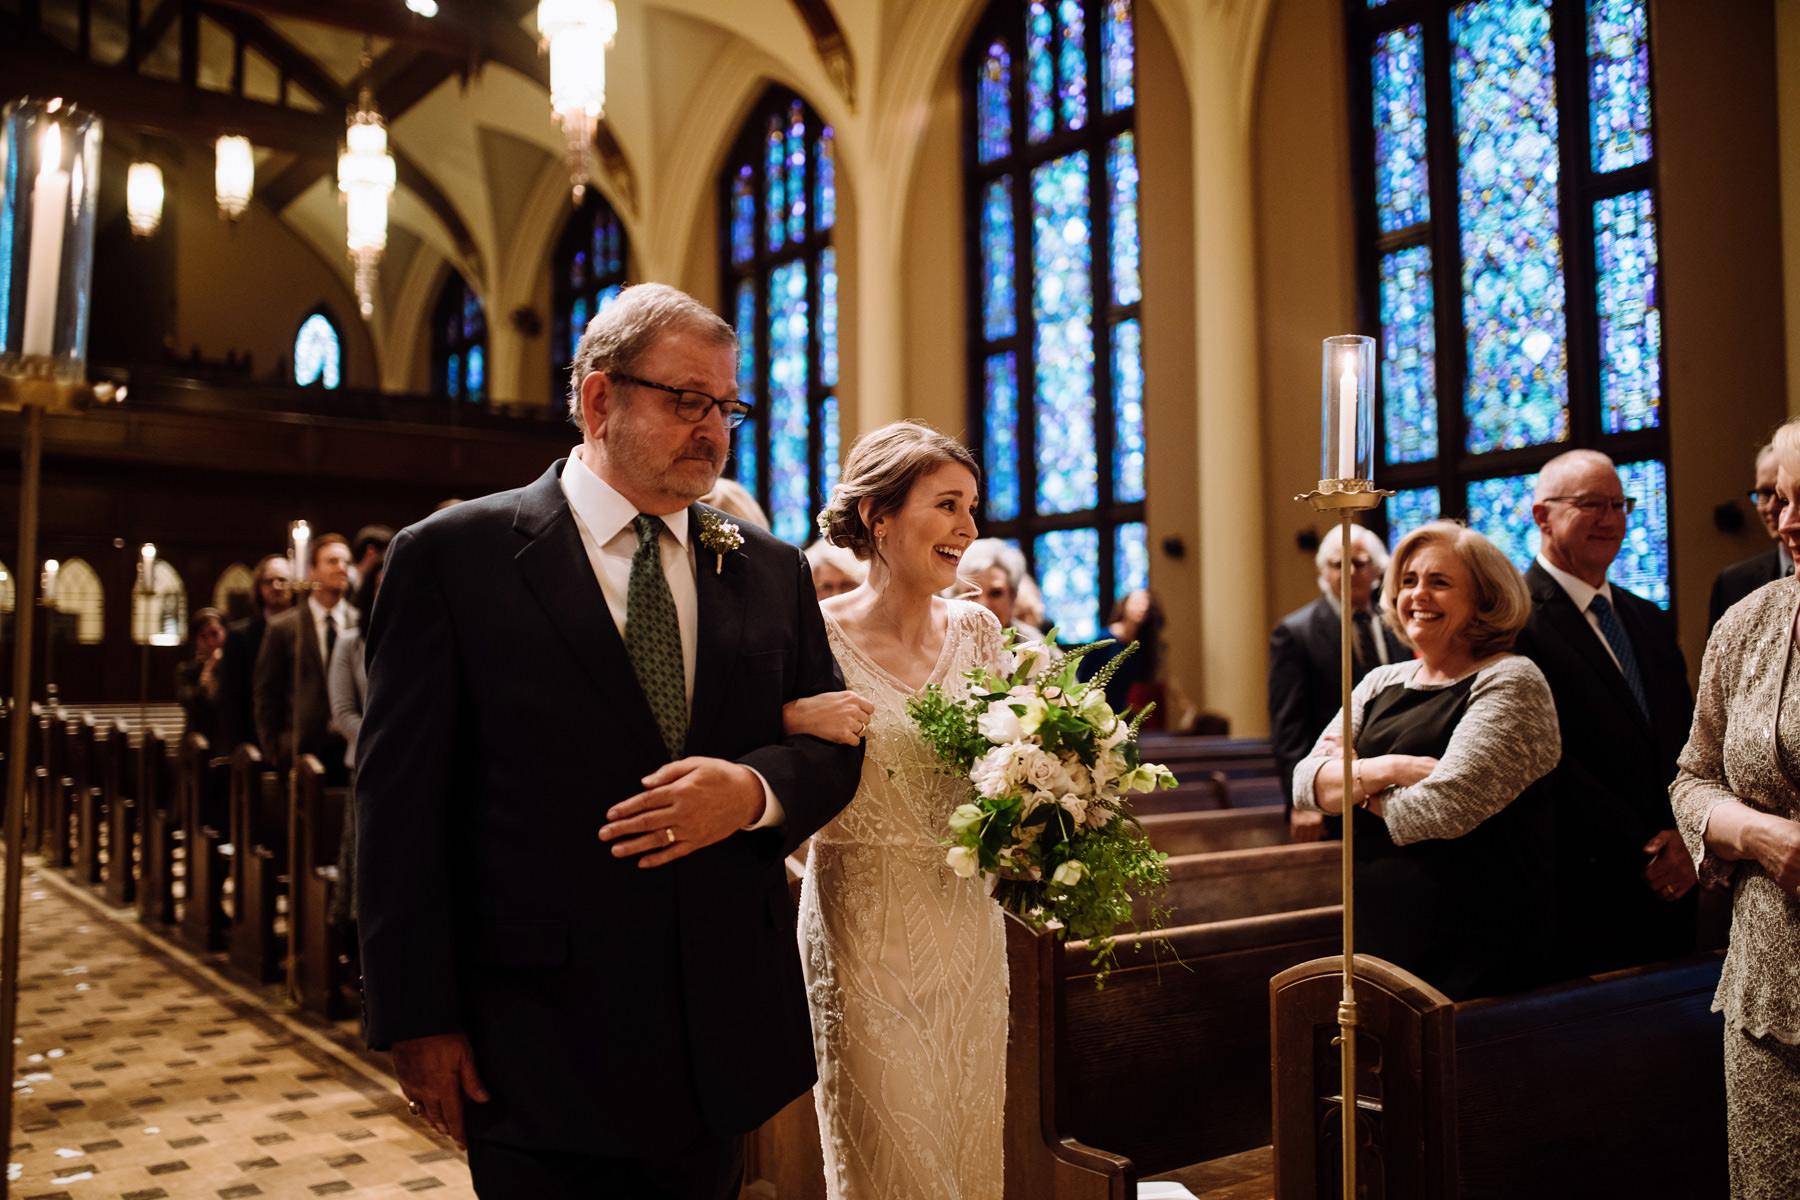 Memorial Presbyterian Wedding in St. Louis Missouri_Kindling Wedding Photography038.JPG